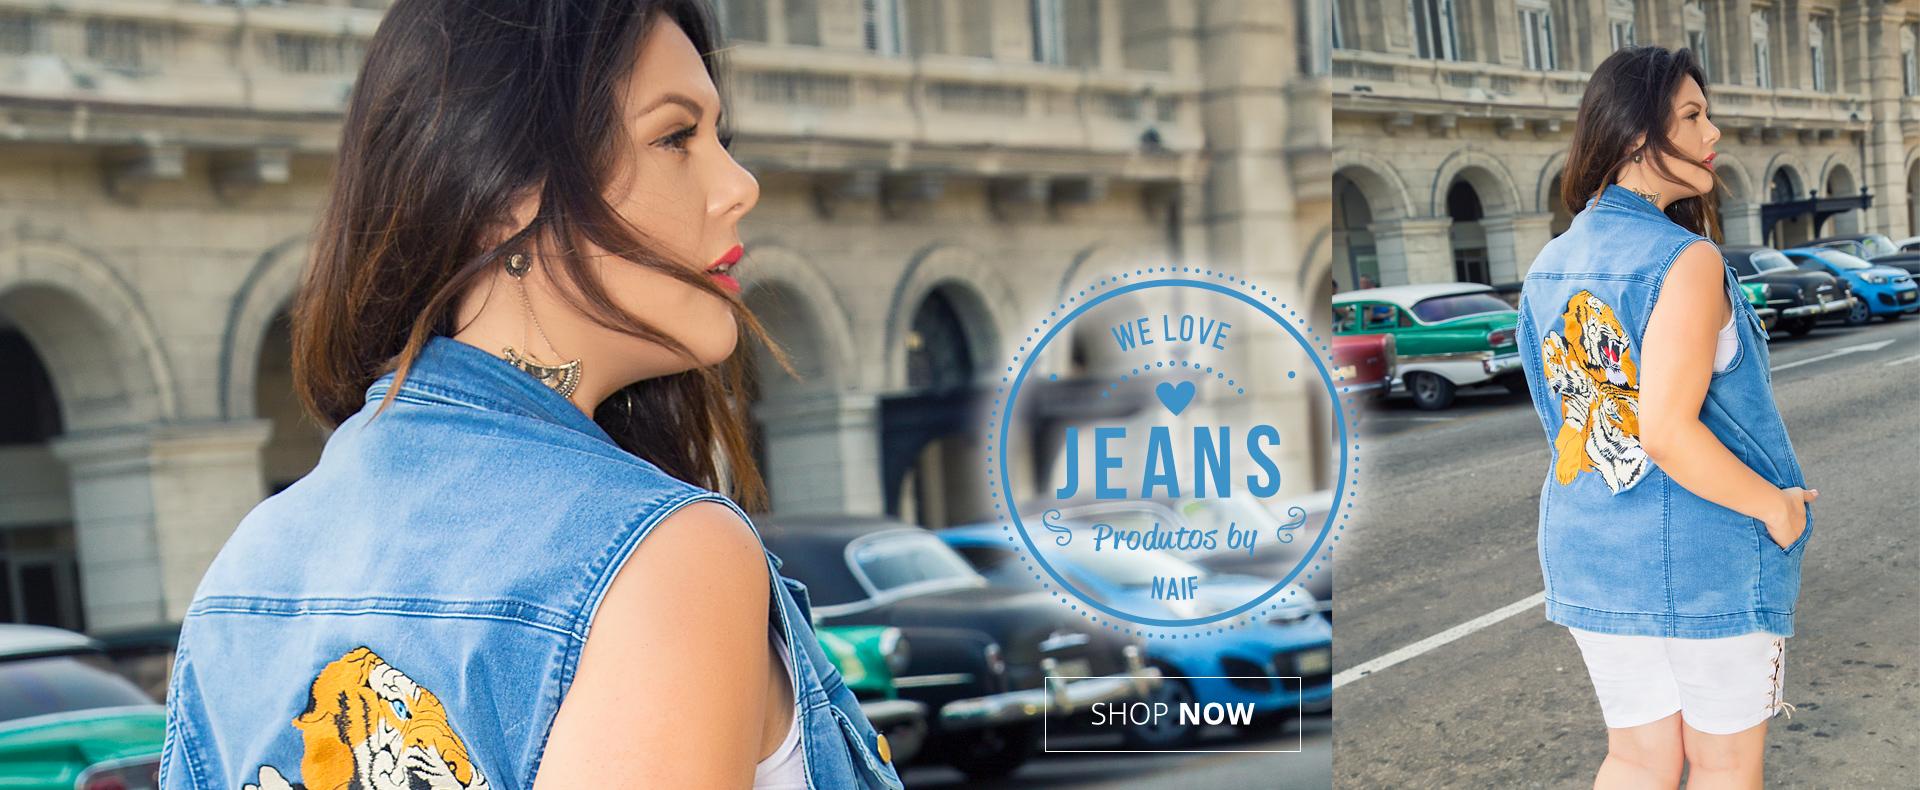 Banner Principal - We Love Jeans